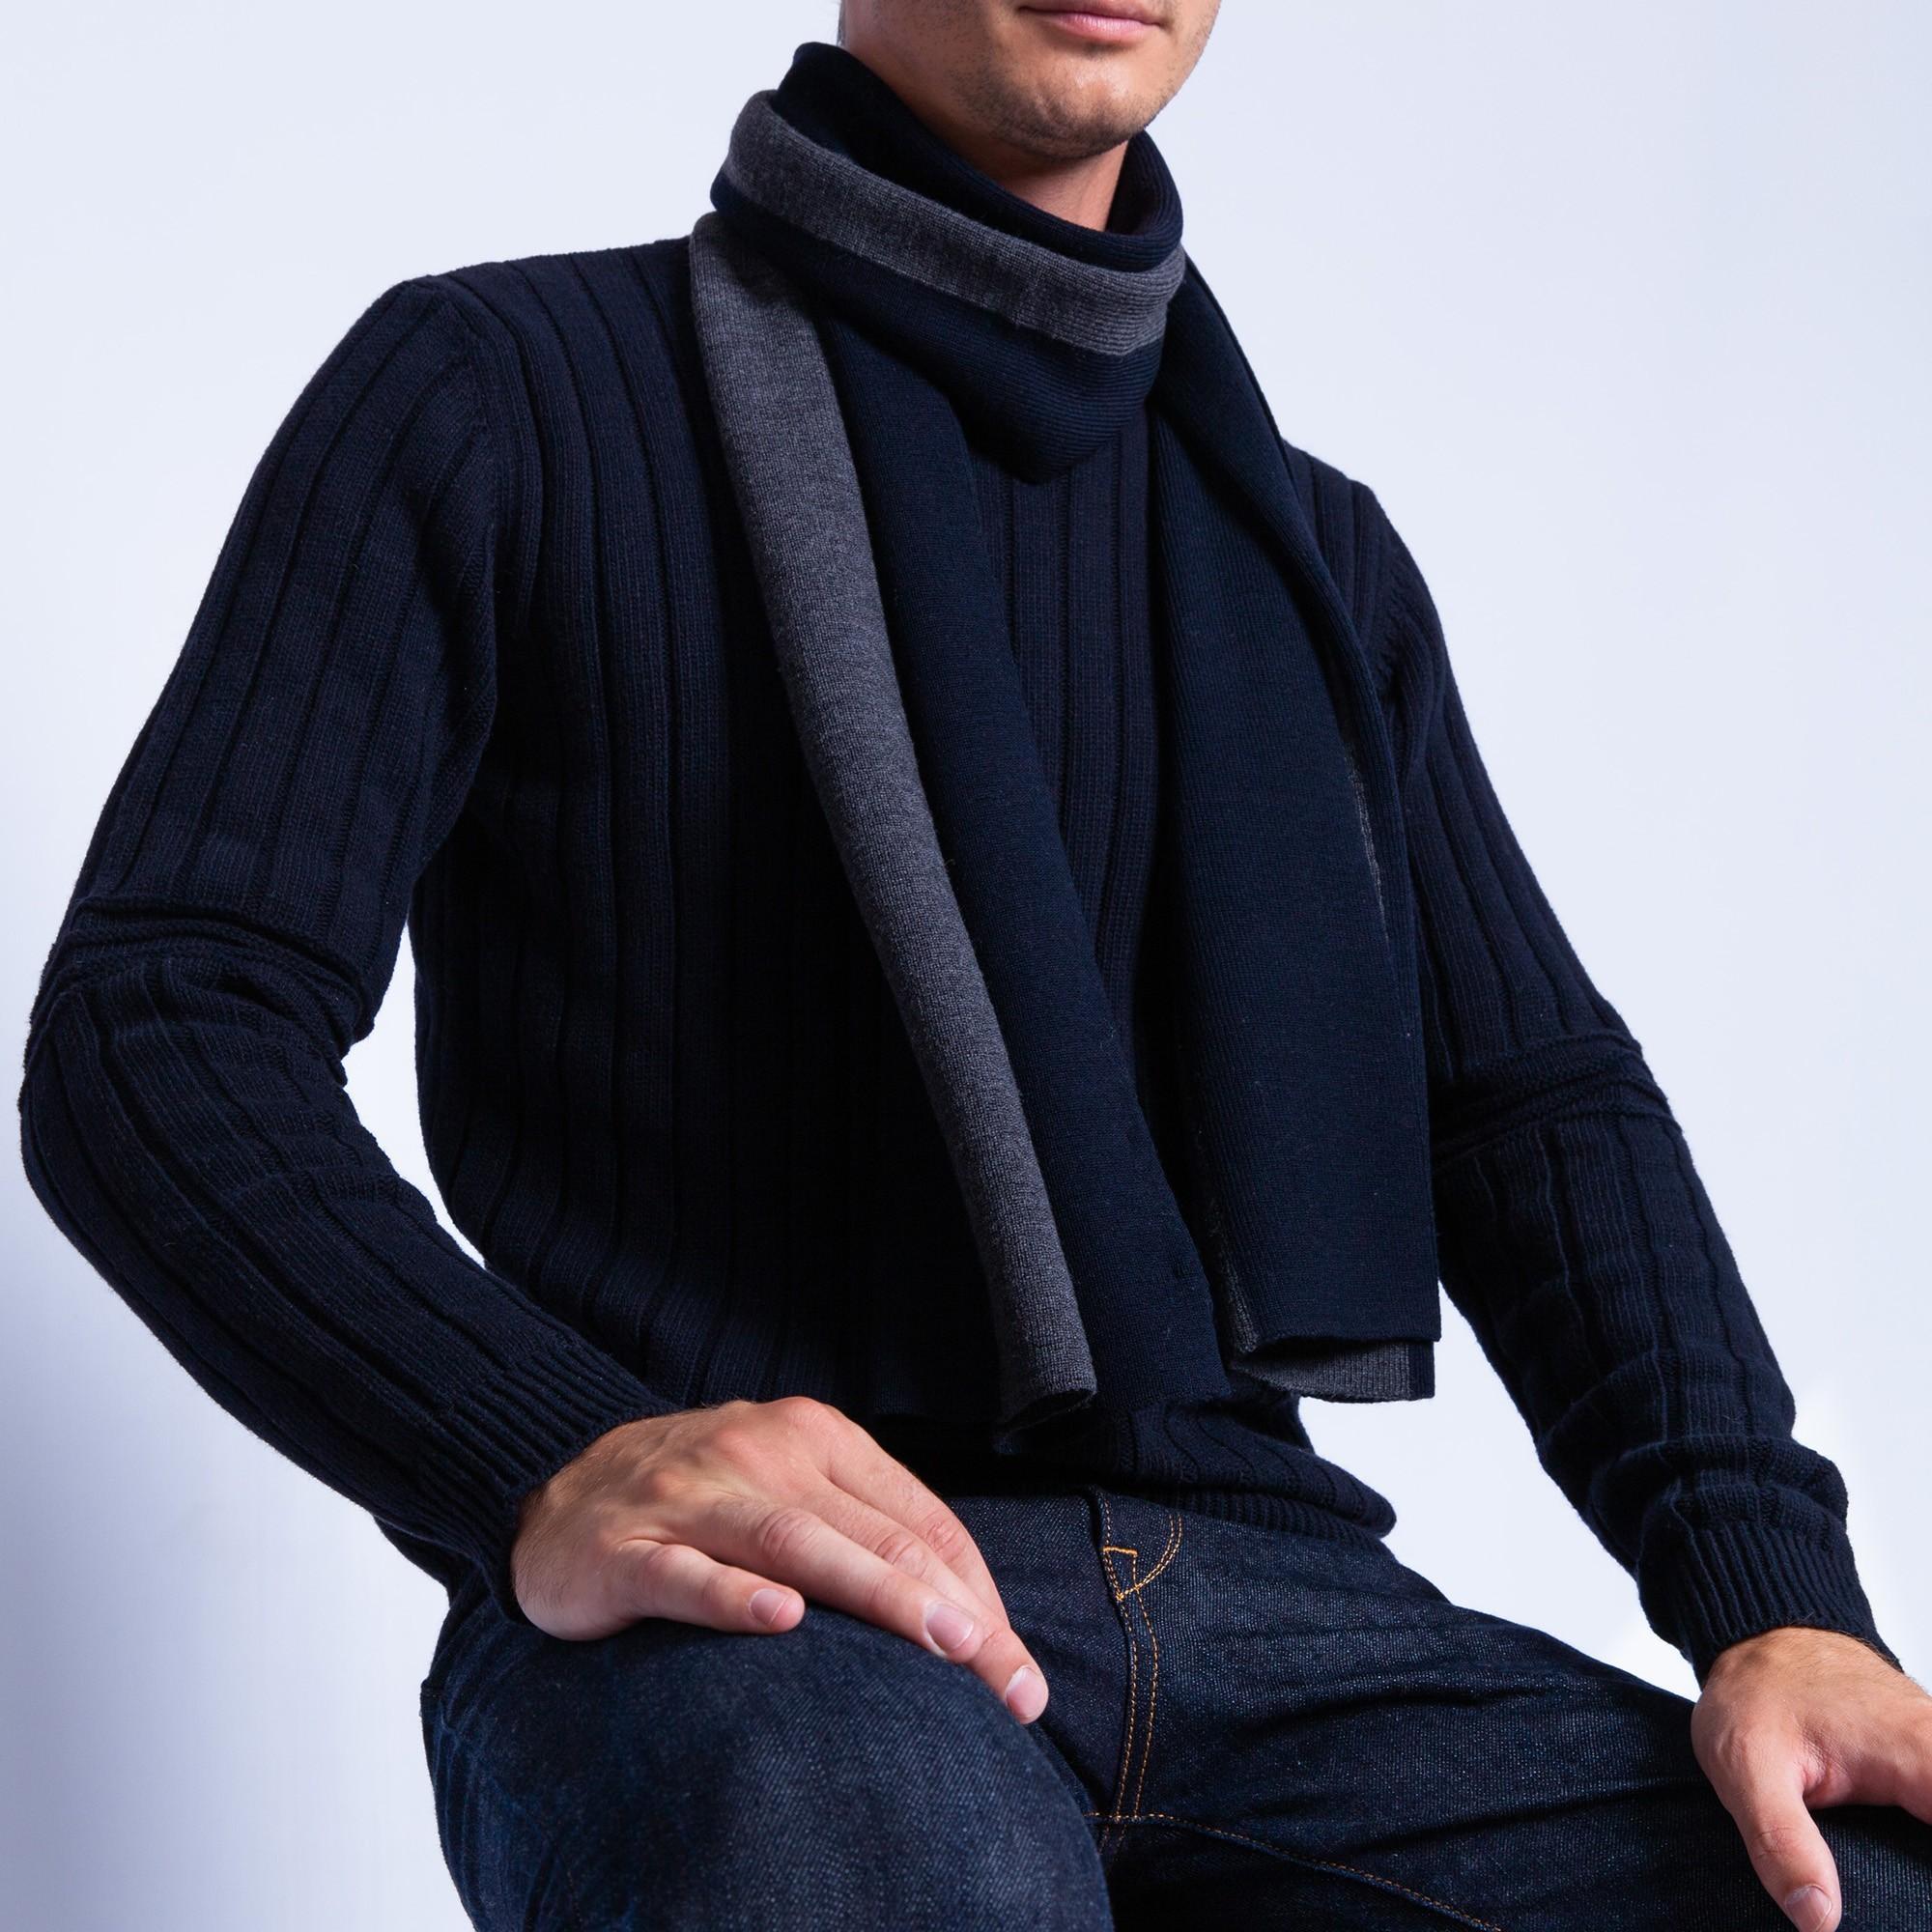 Echarpe rayée en laine mérinos - Fathy 6340 marine rafale - 05 bleu marine 4d5c736778a